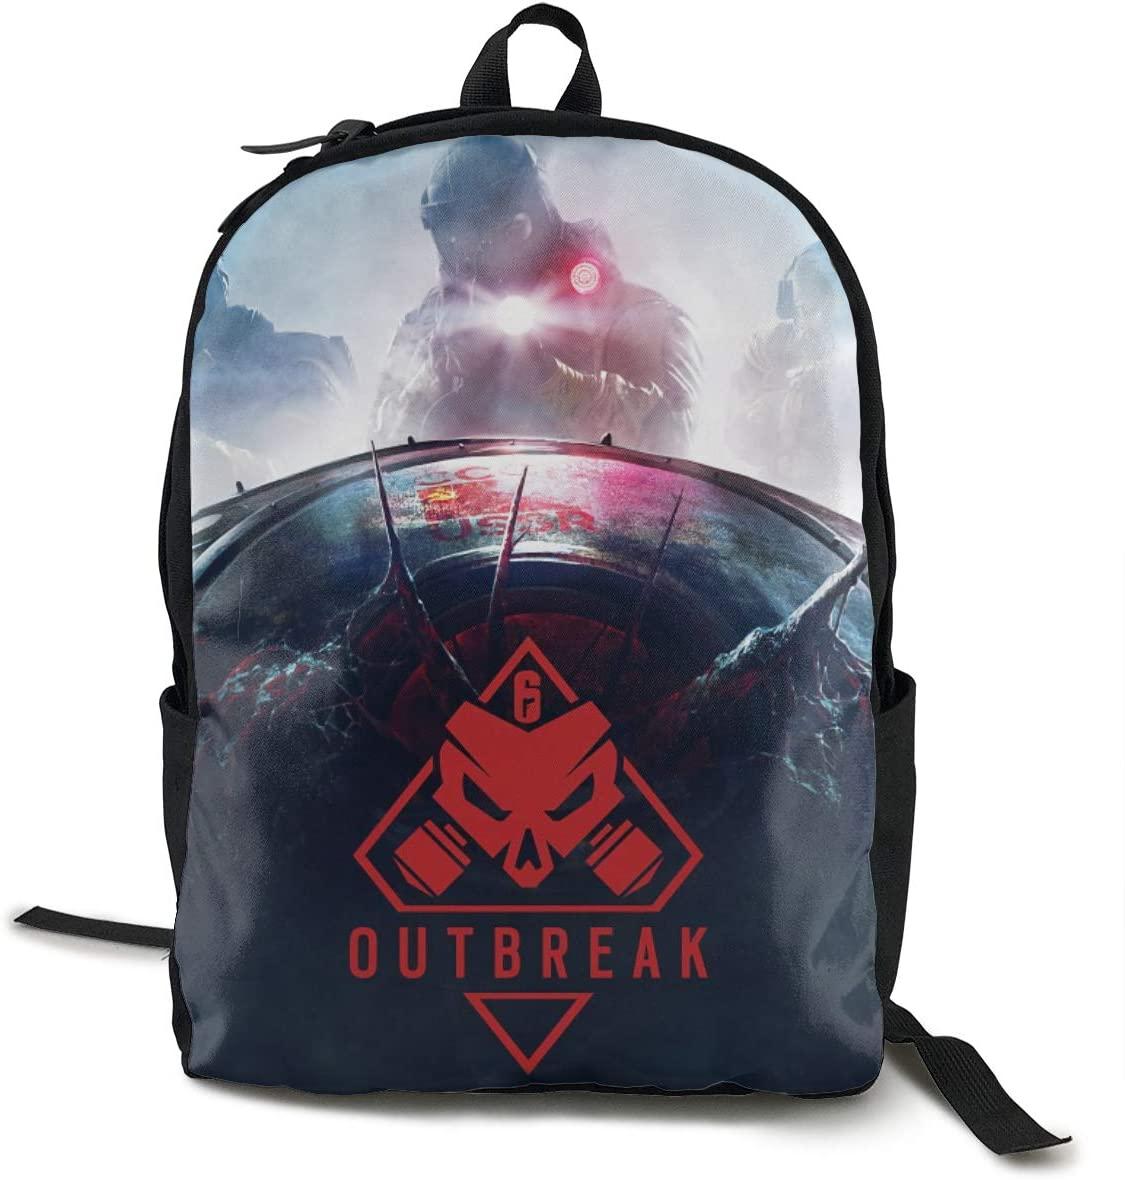 GekhHaon Rainbow Six Siege College Backpack Student Bookbag Multipurpose DaypacksTraveling Backpack